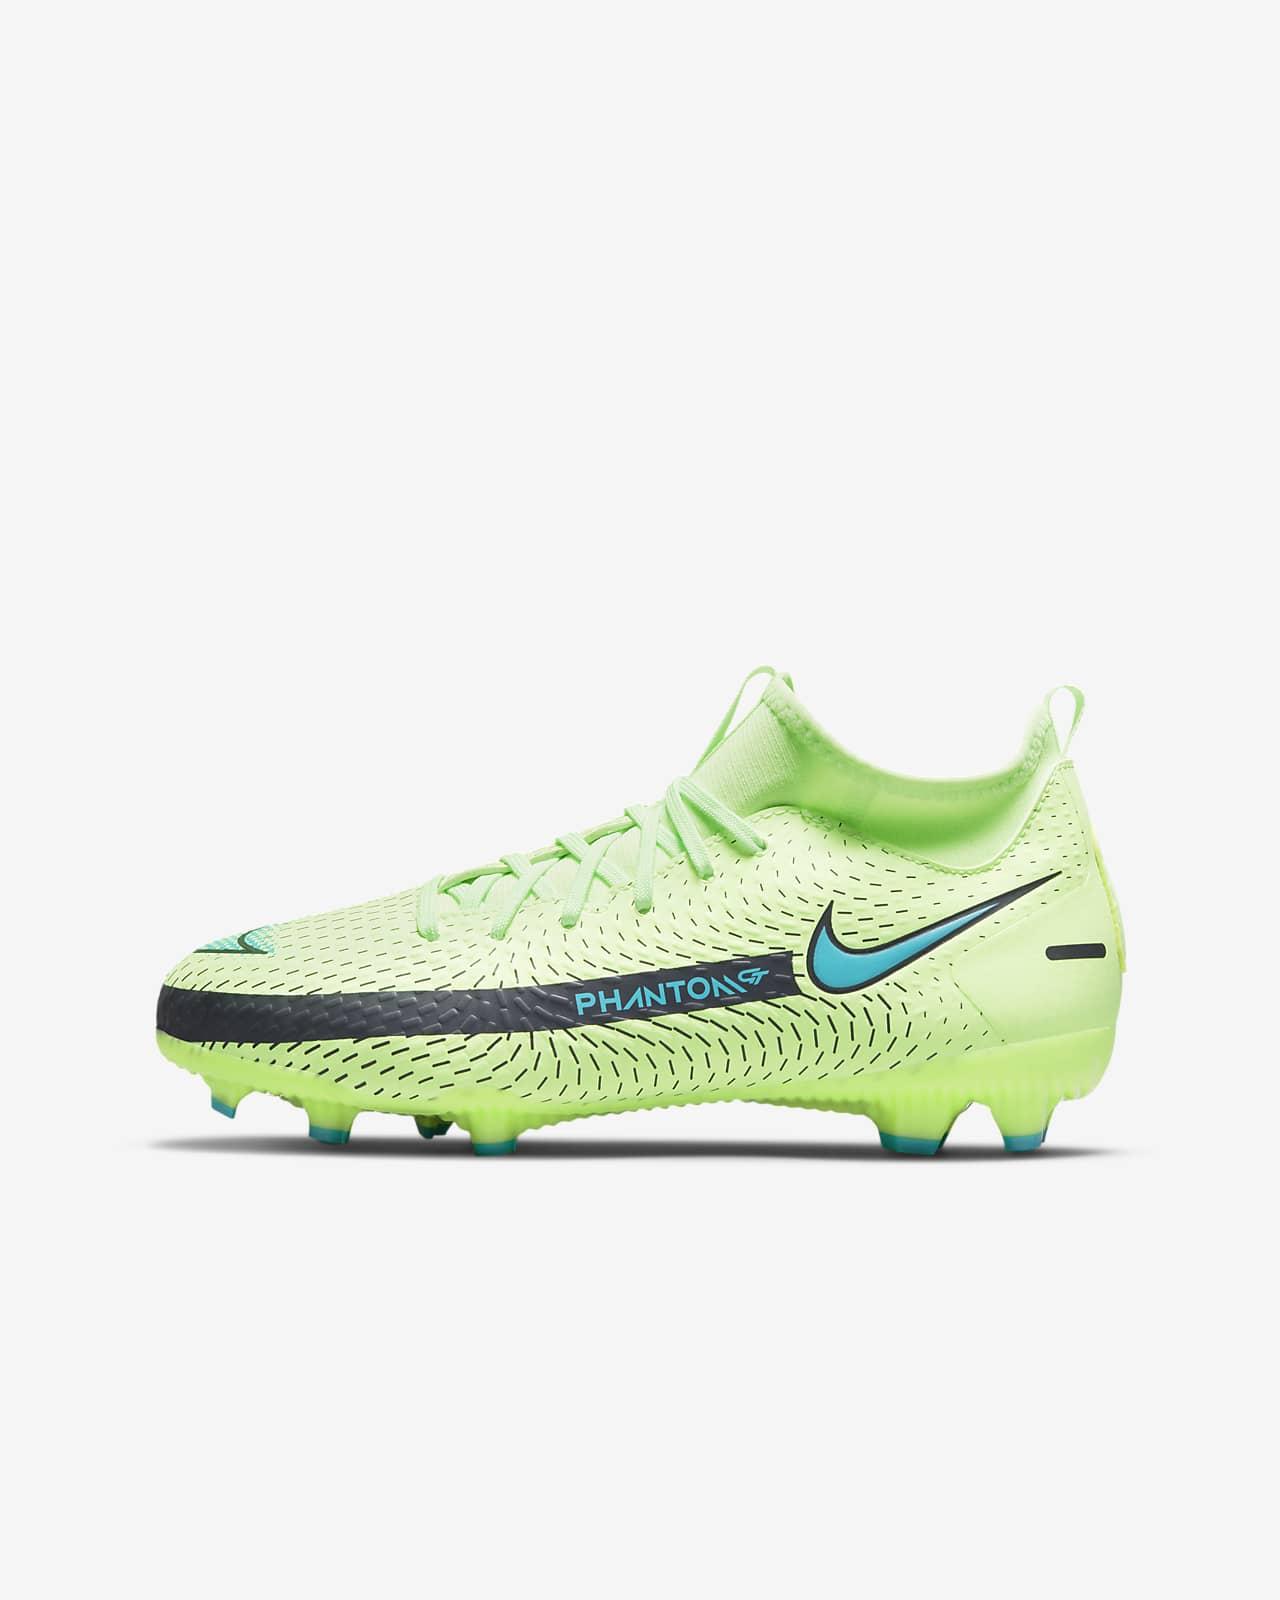 Scarpa da calcio multiterreno Nike Jr. Phantom GT Academy Dynamic Fit MG - Bambini/Ragazzi